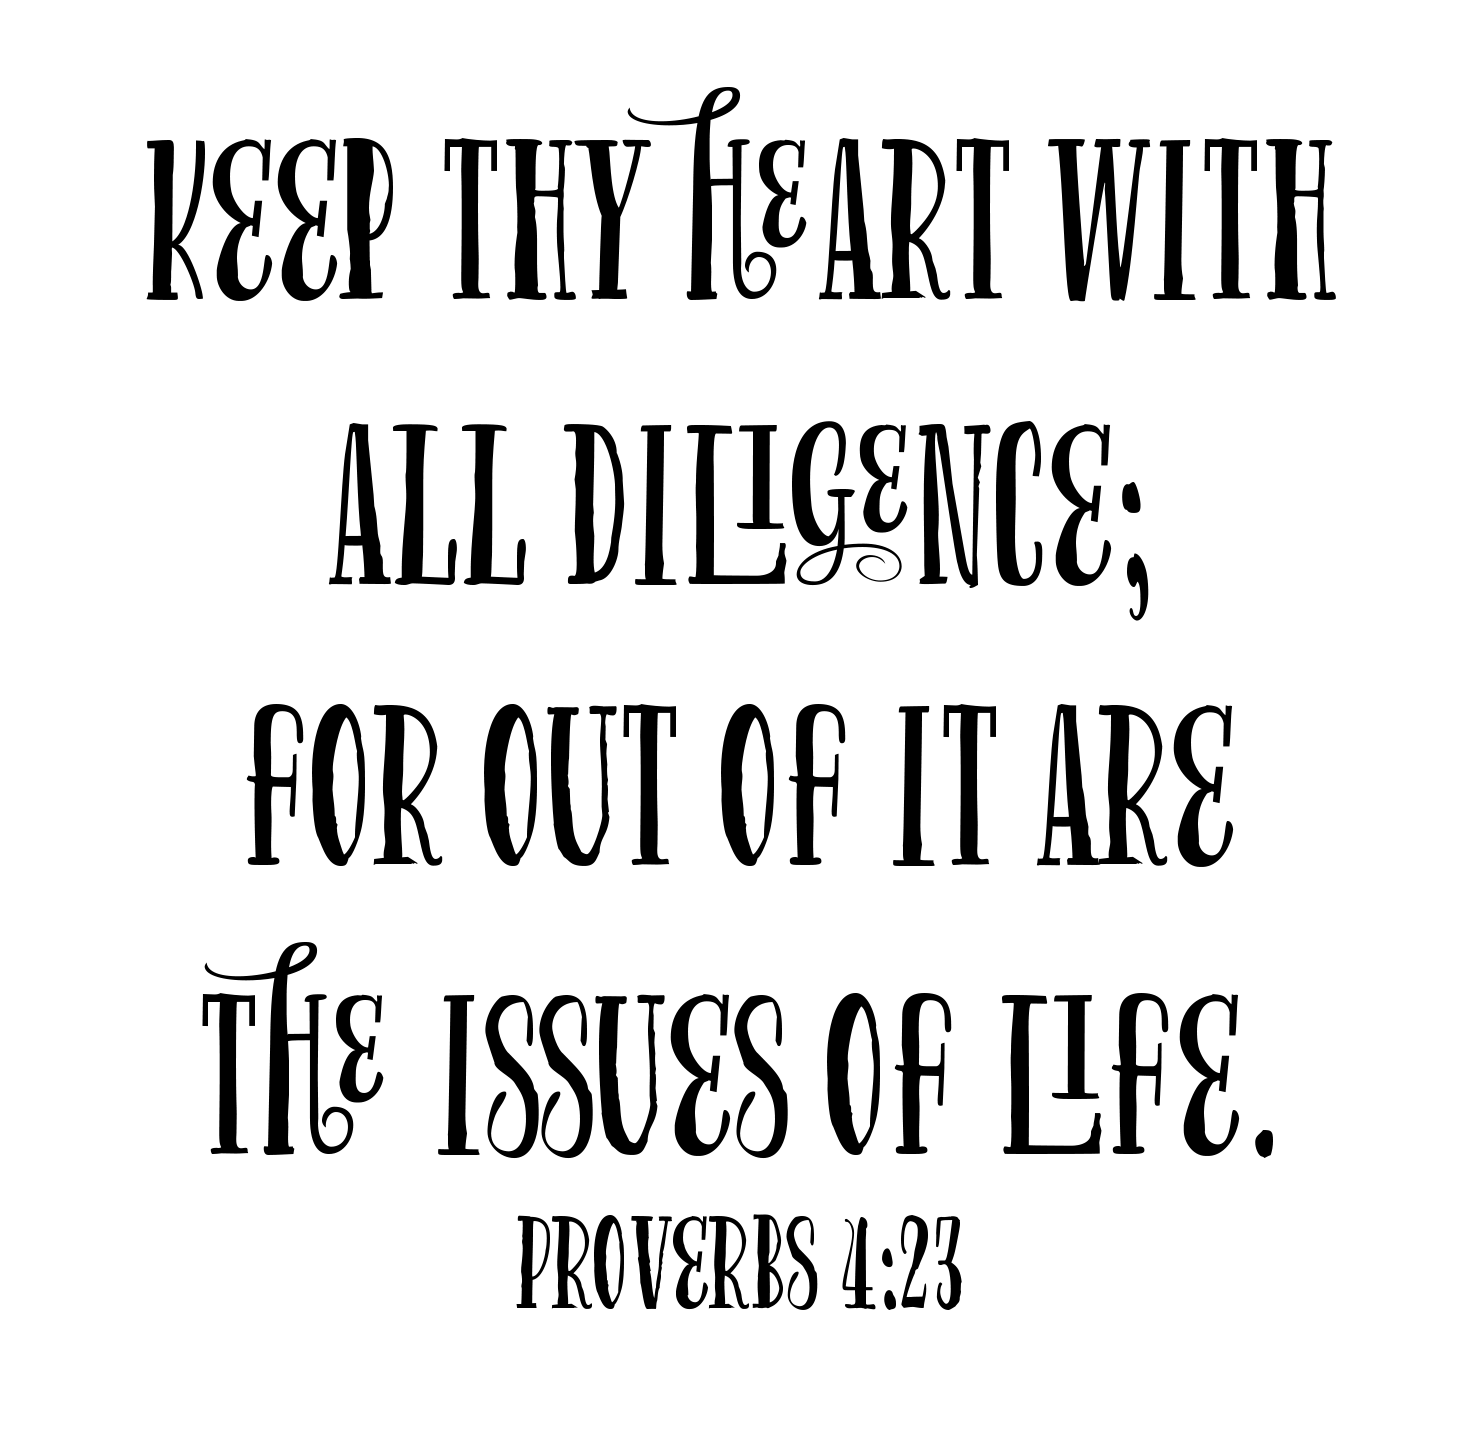 Gymnastics Logo Design Ideas Black And White Outlines Orange